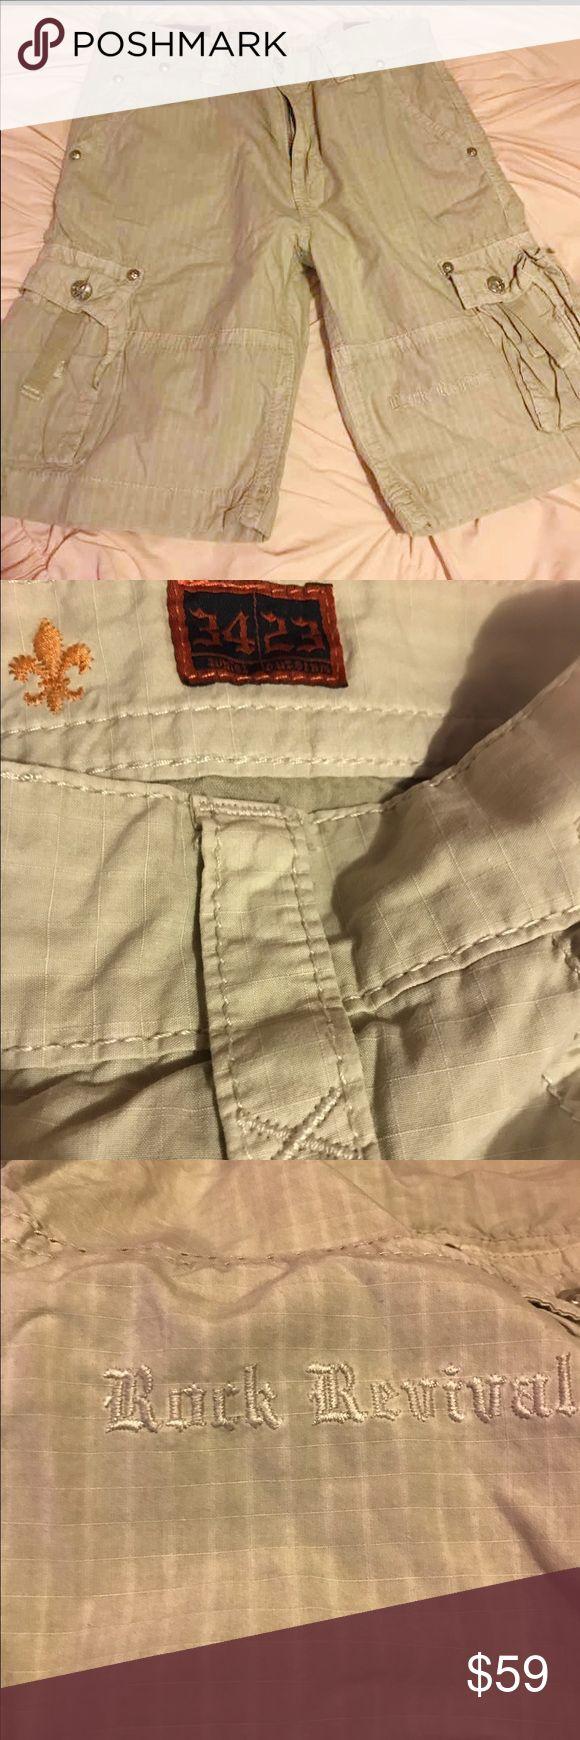 Men's Rock Revival shorts size 34 Men's Rock Revival shorts in excellent condition. Only worn maybe 3 times. Size 34 Rock Revival Shorts Cargo